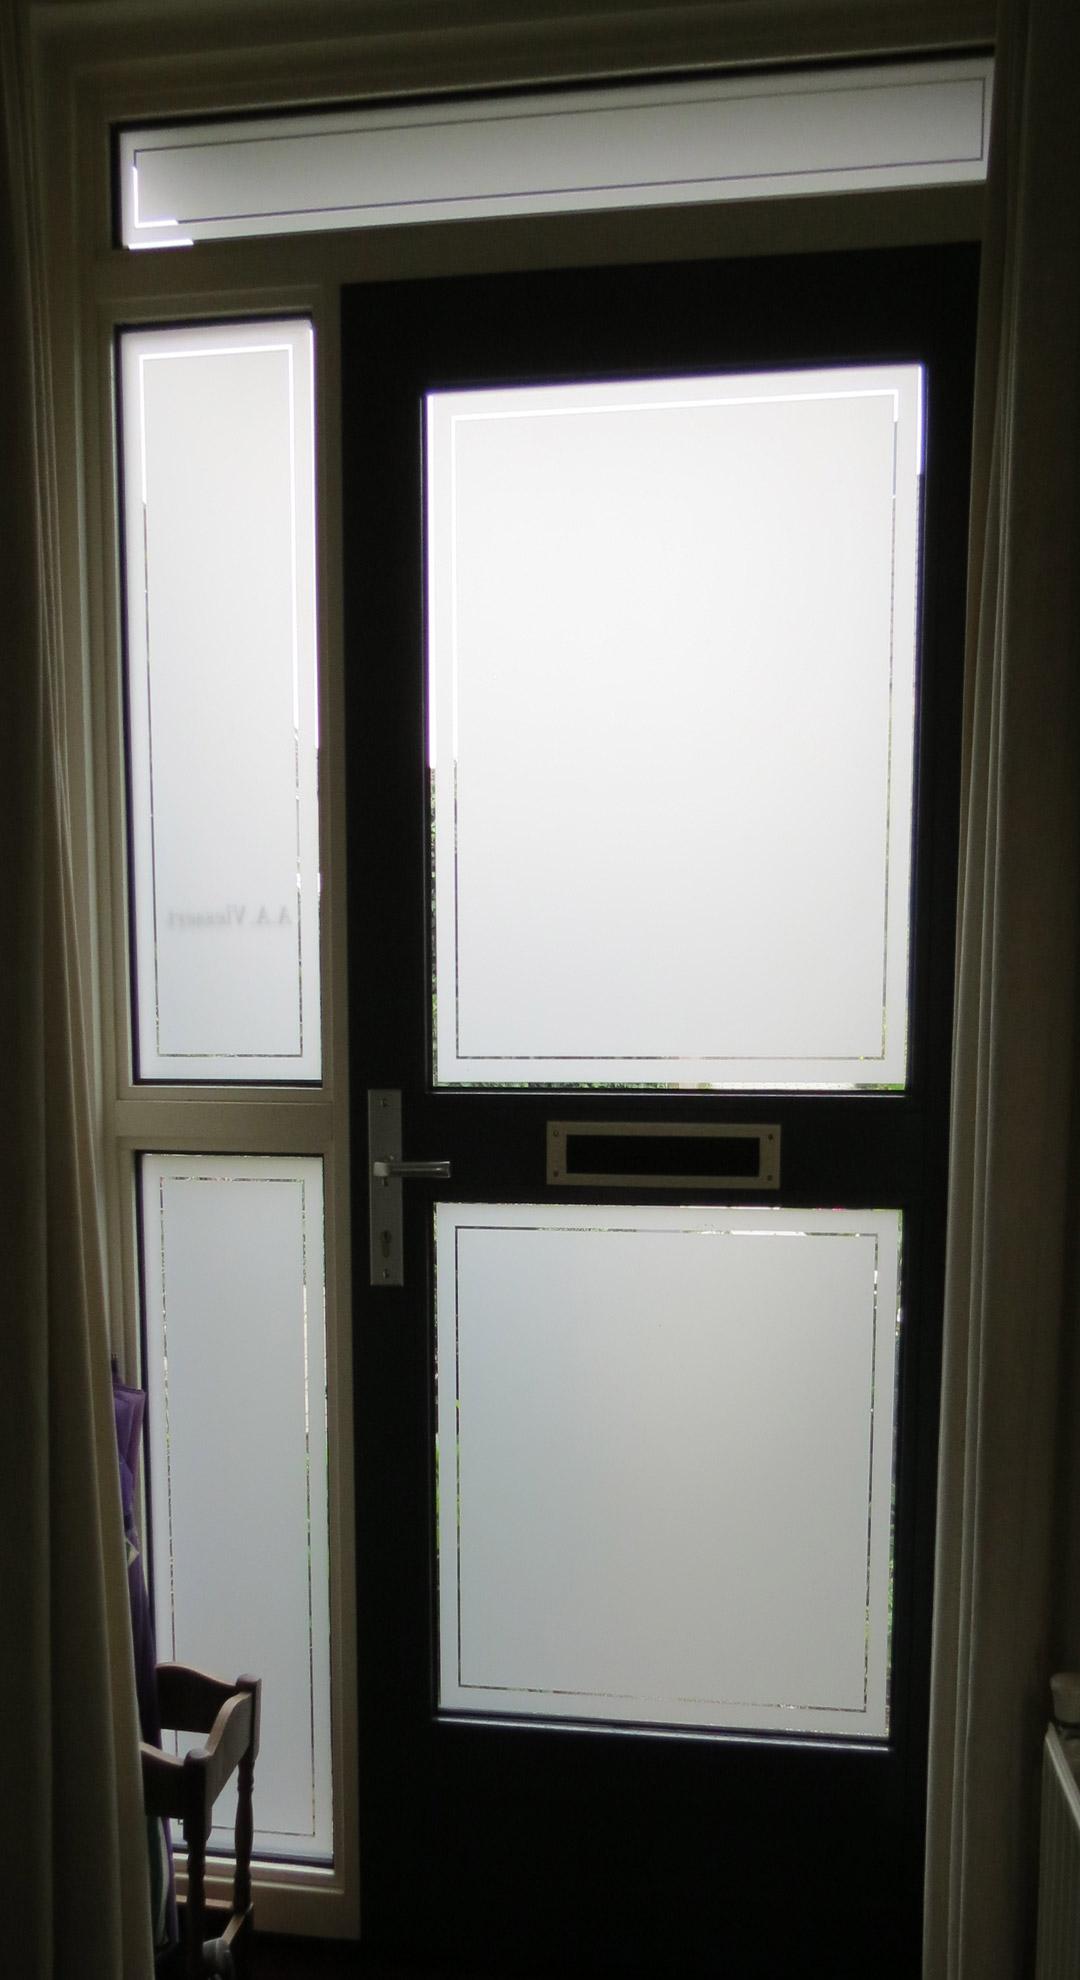 1980 #1E1C15 Permalink Frosted Widow Film Front Door Fp Frosted Window Film image Front Doors With Frosted Glass 38731080